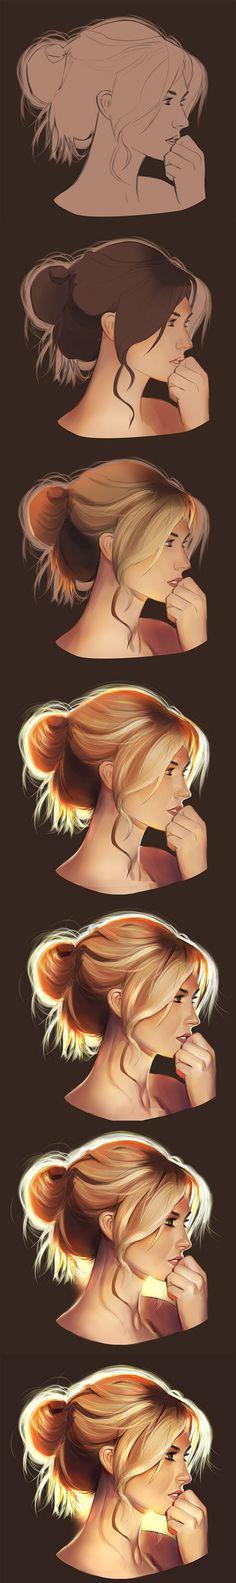 digital face painting photoshop tutorial